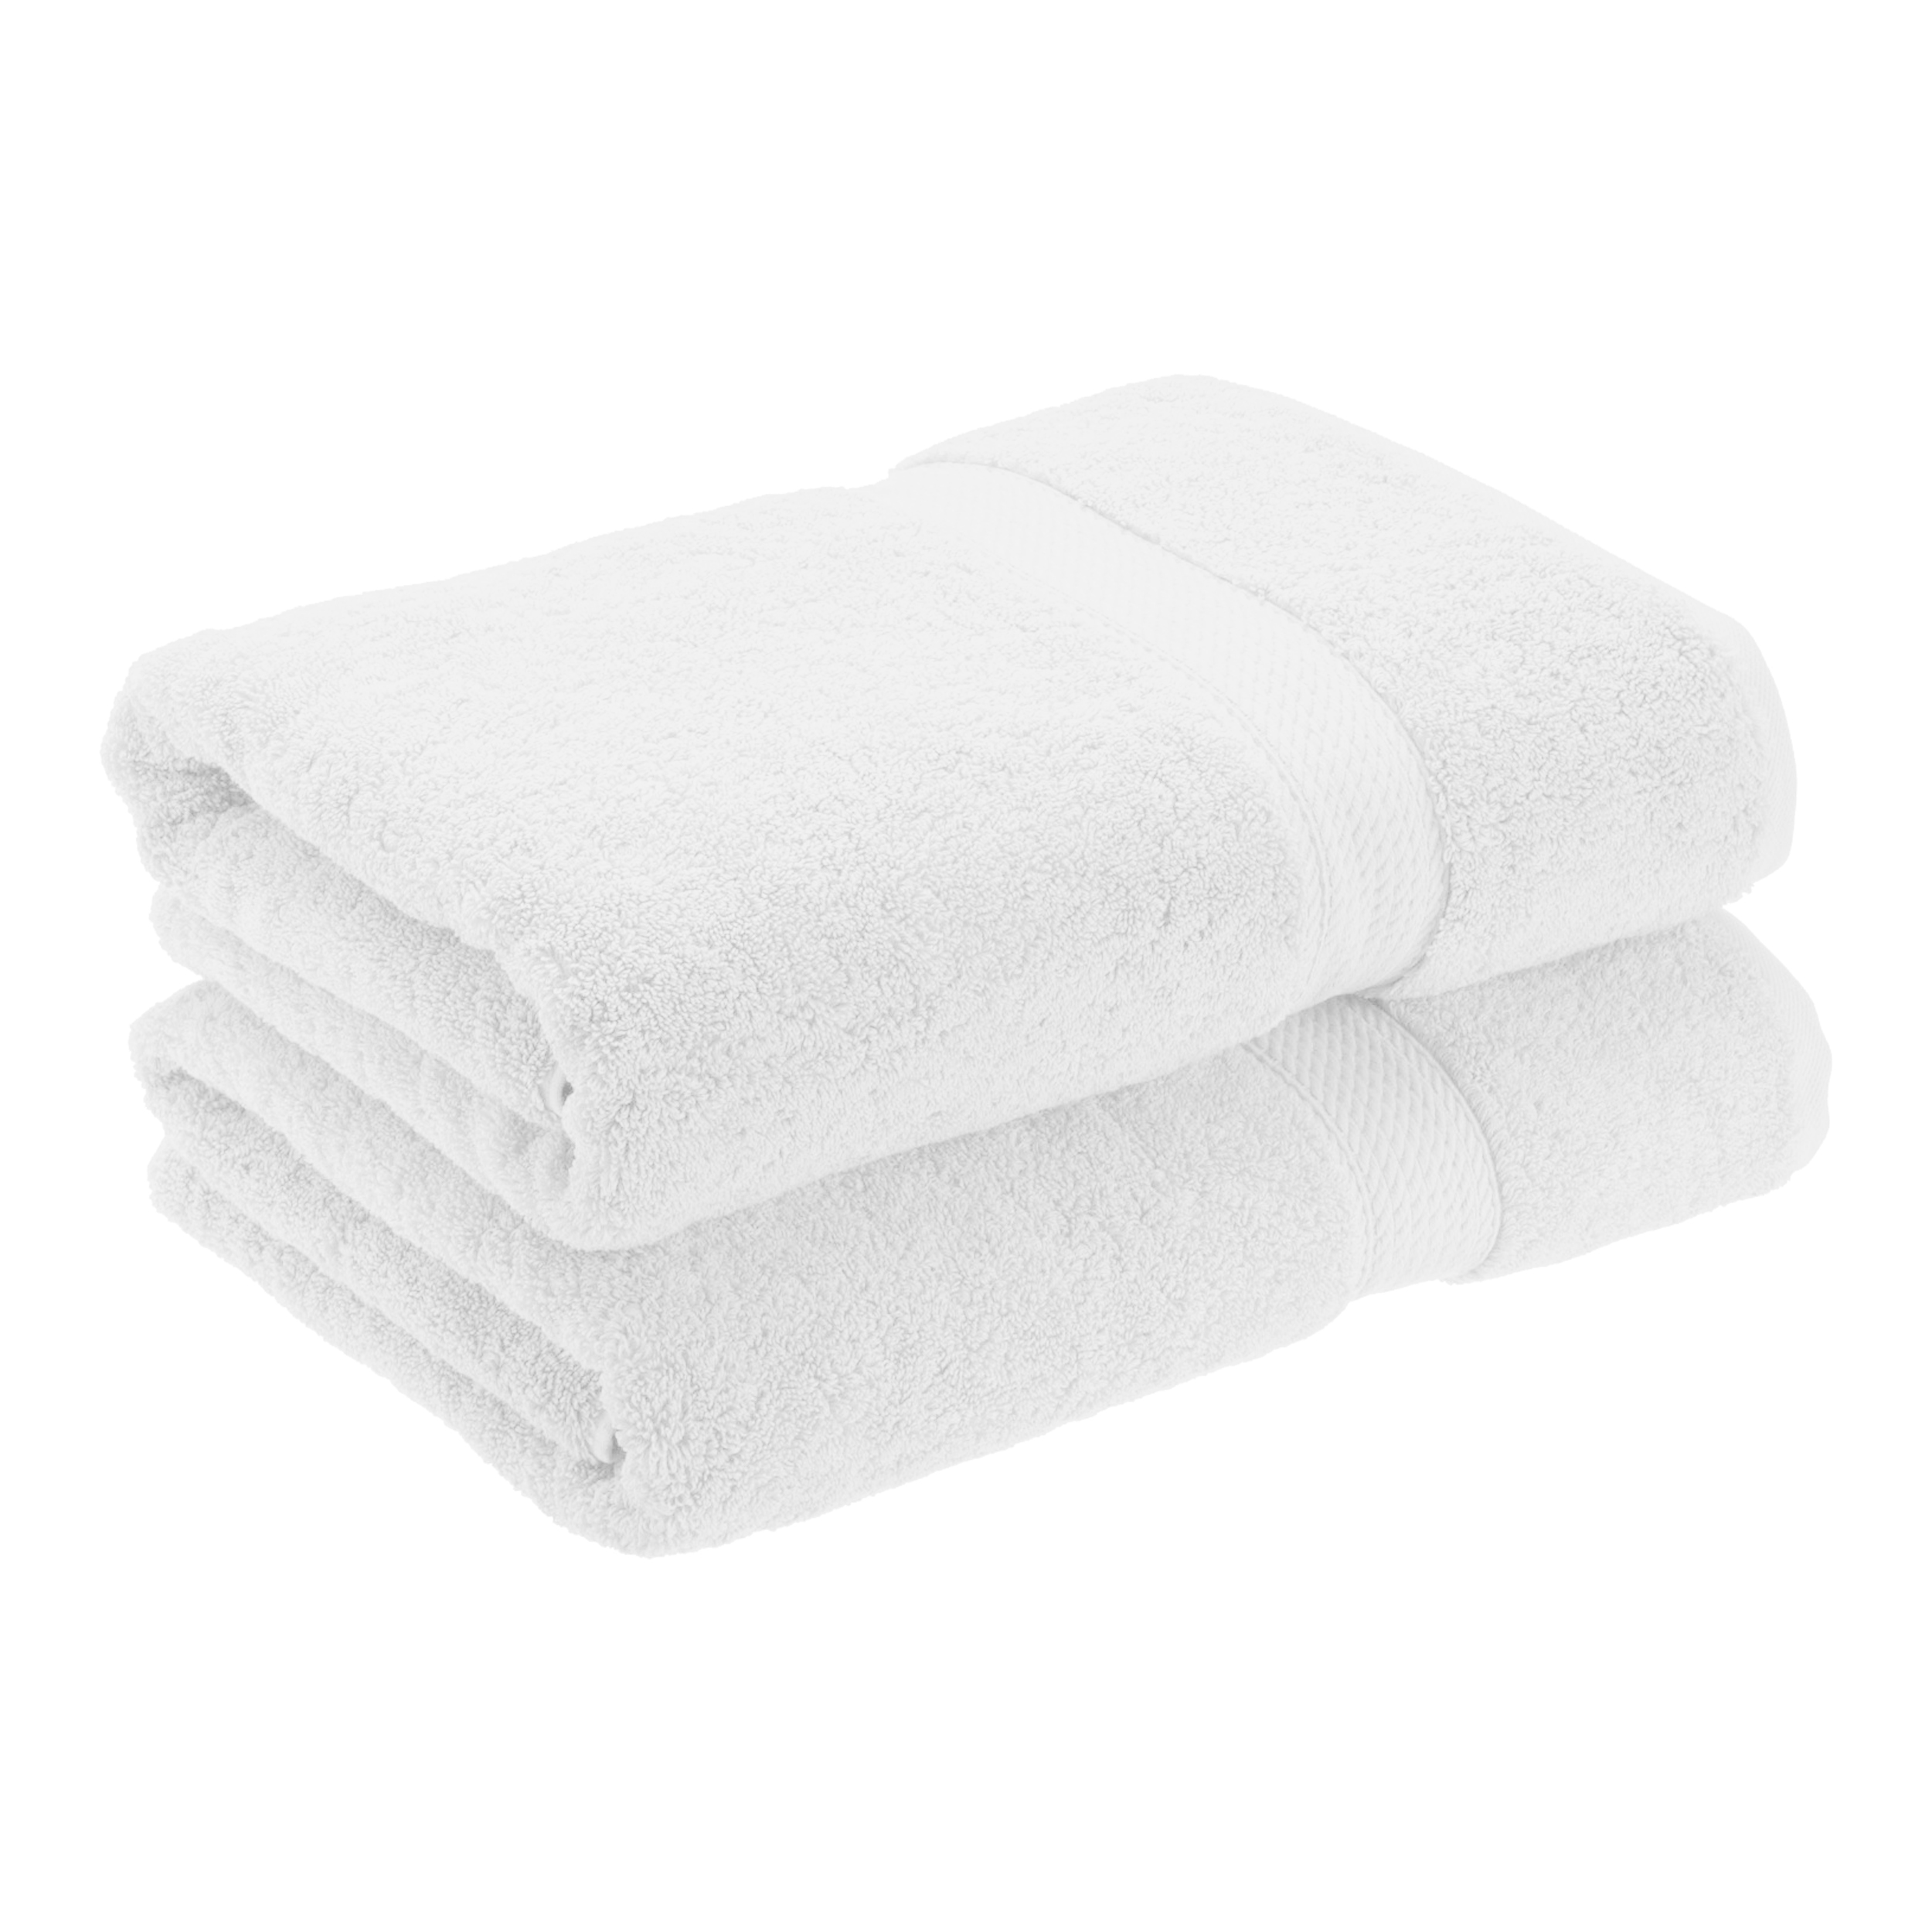 Superior 900GSM Egyptian Quality Cotton 2-Piece Bath Towel Set